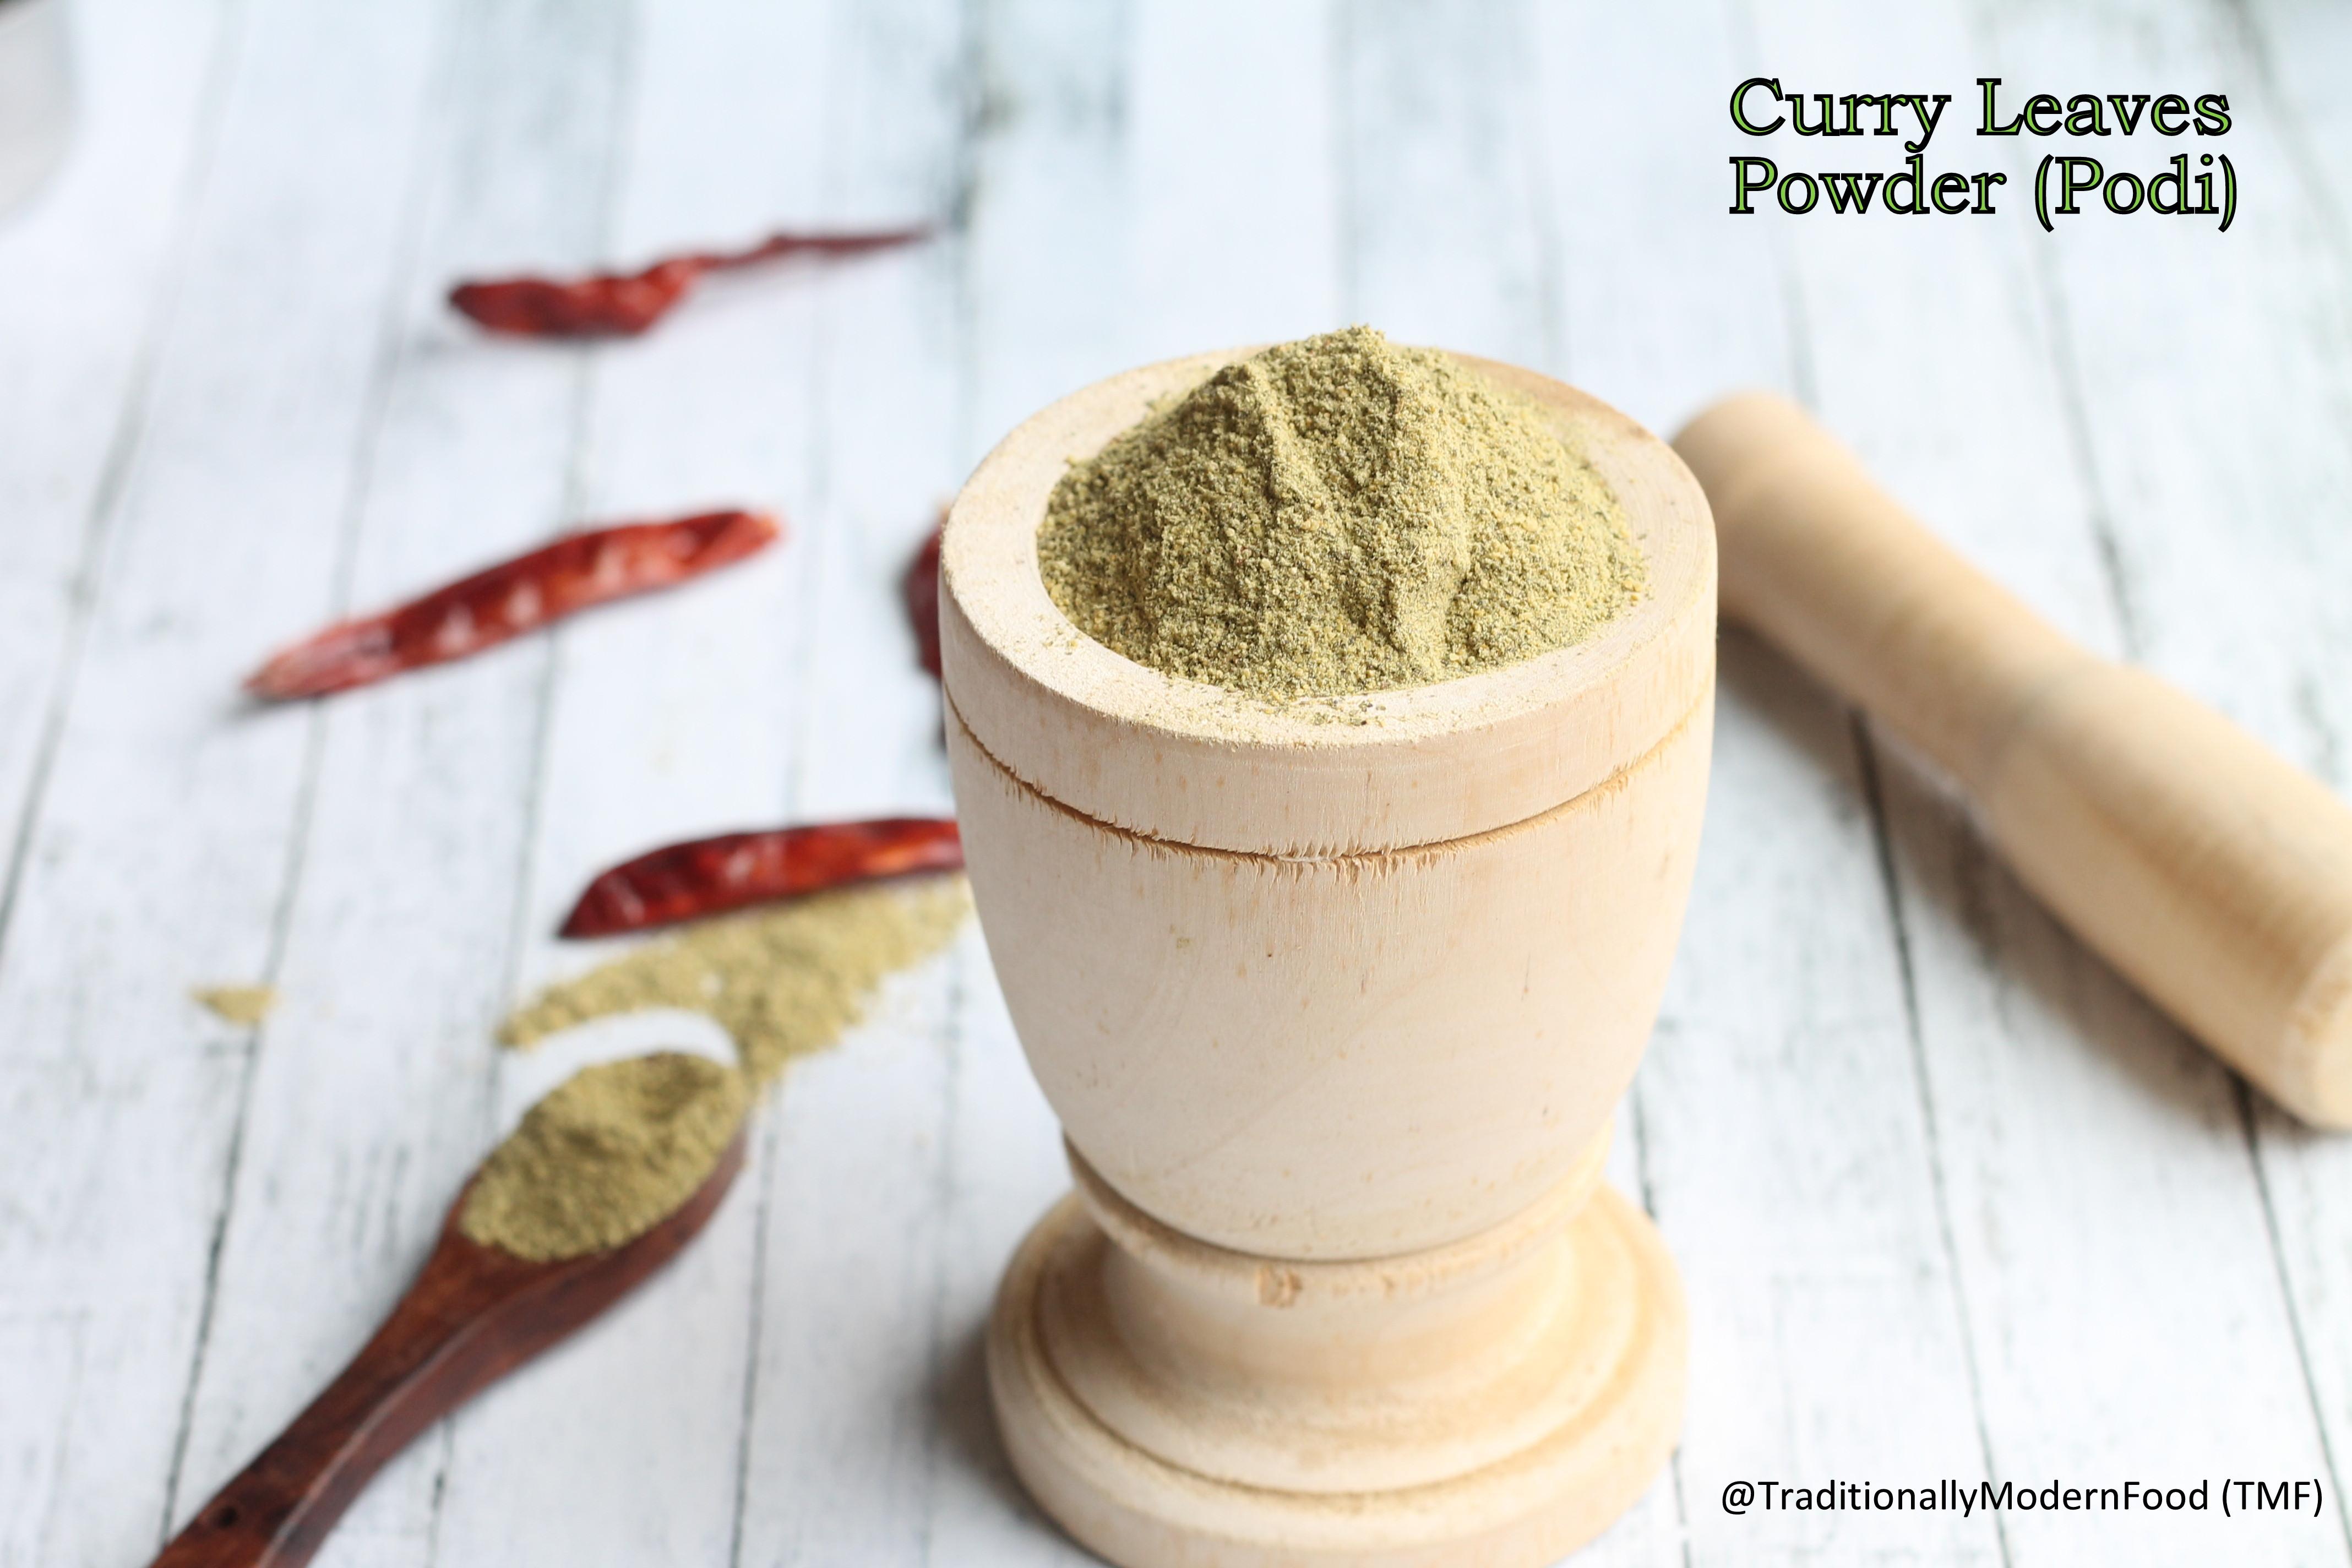 Curryleaves podi